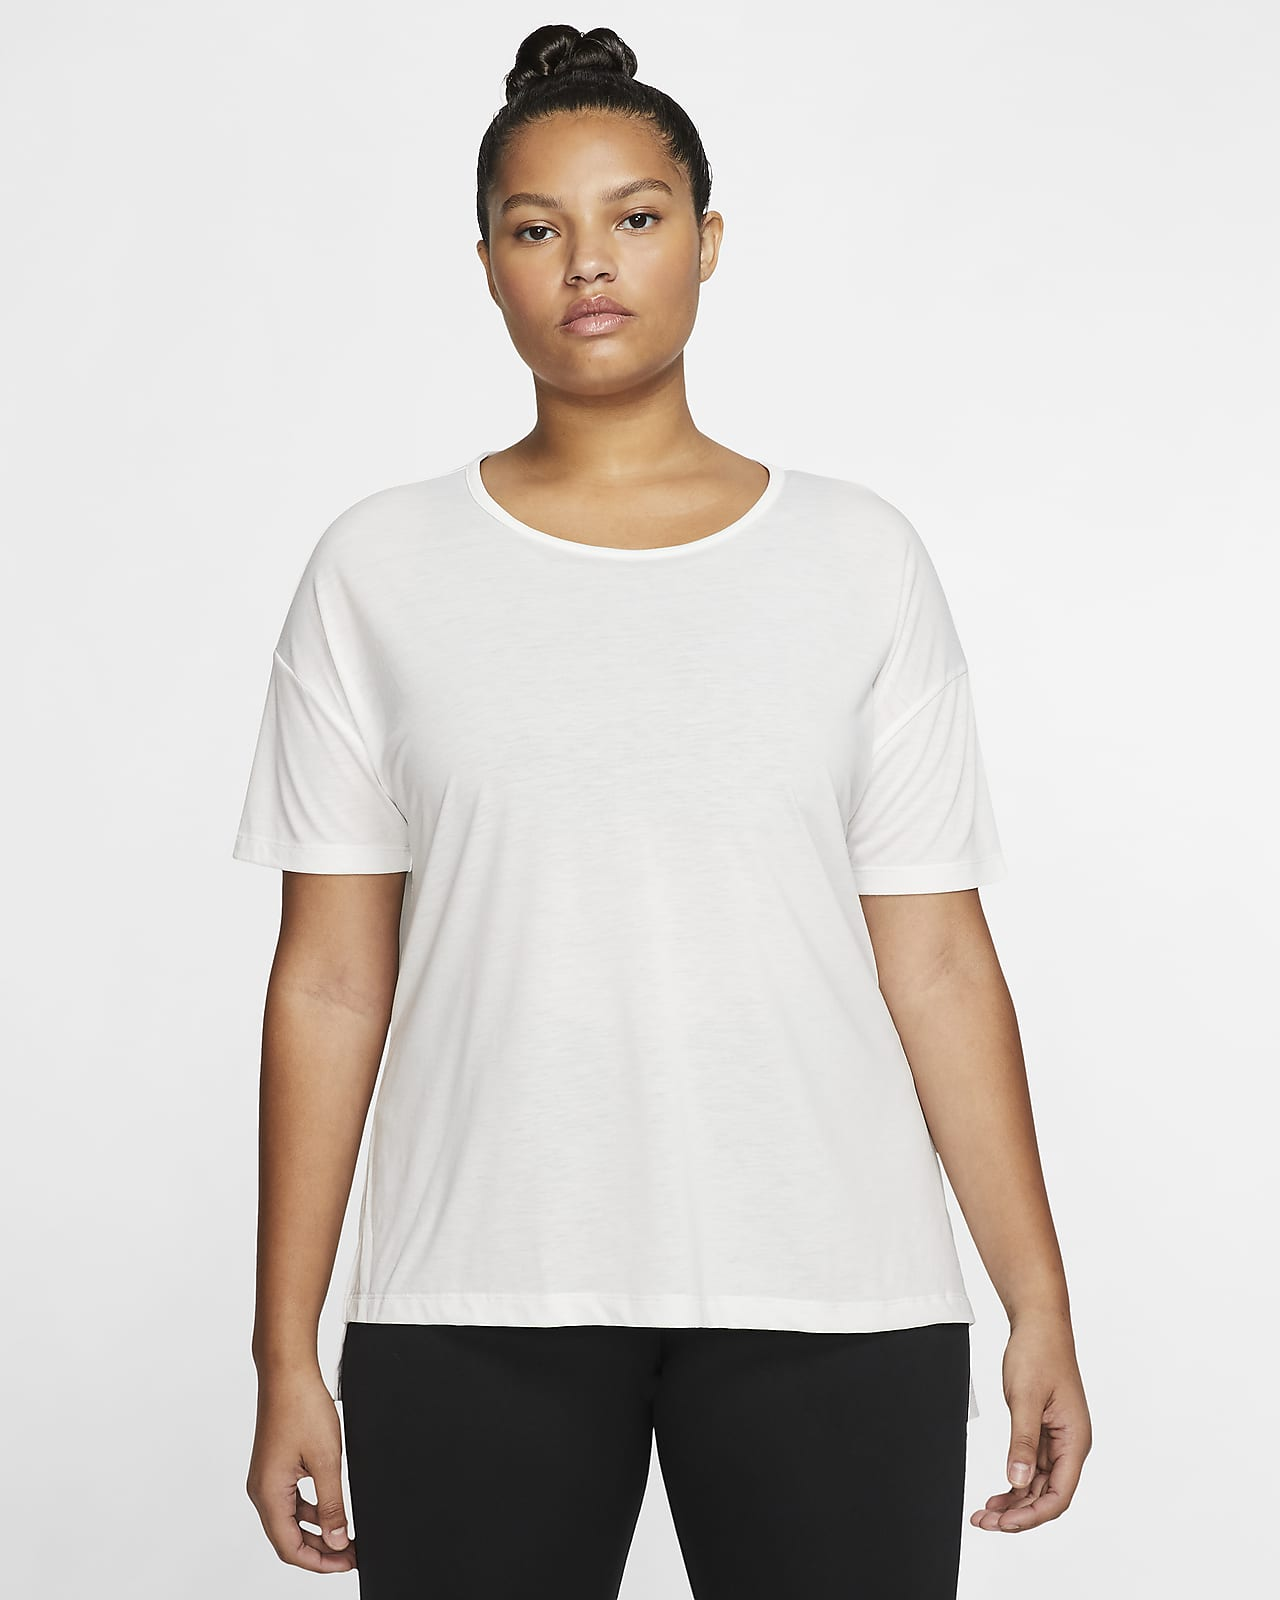 Camiseta de manga corta para mujer Nike Yoga (talla grande)